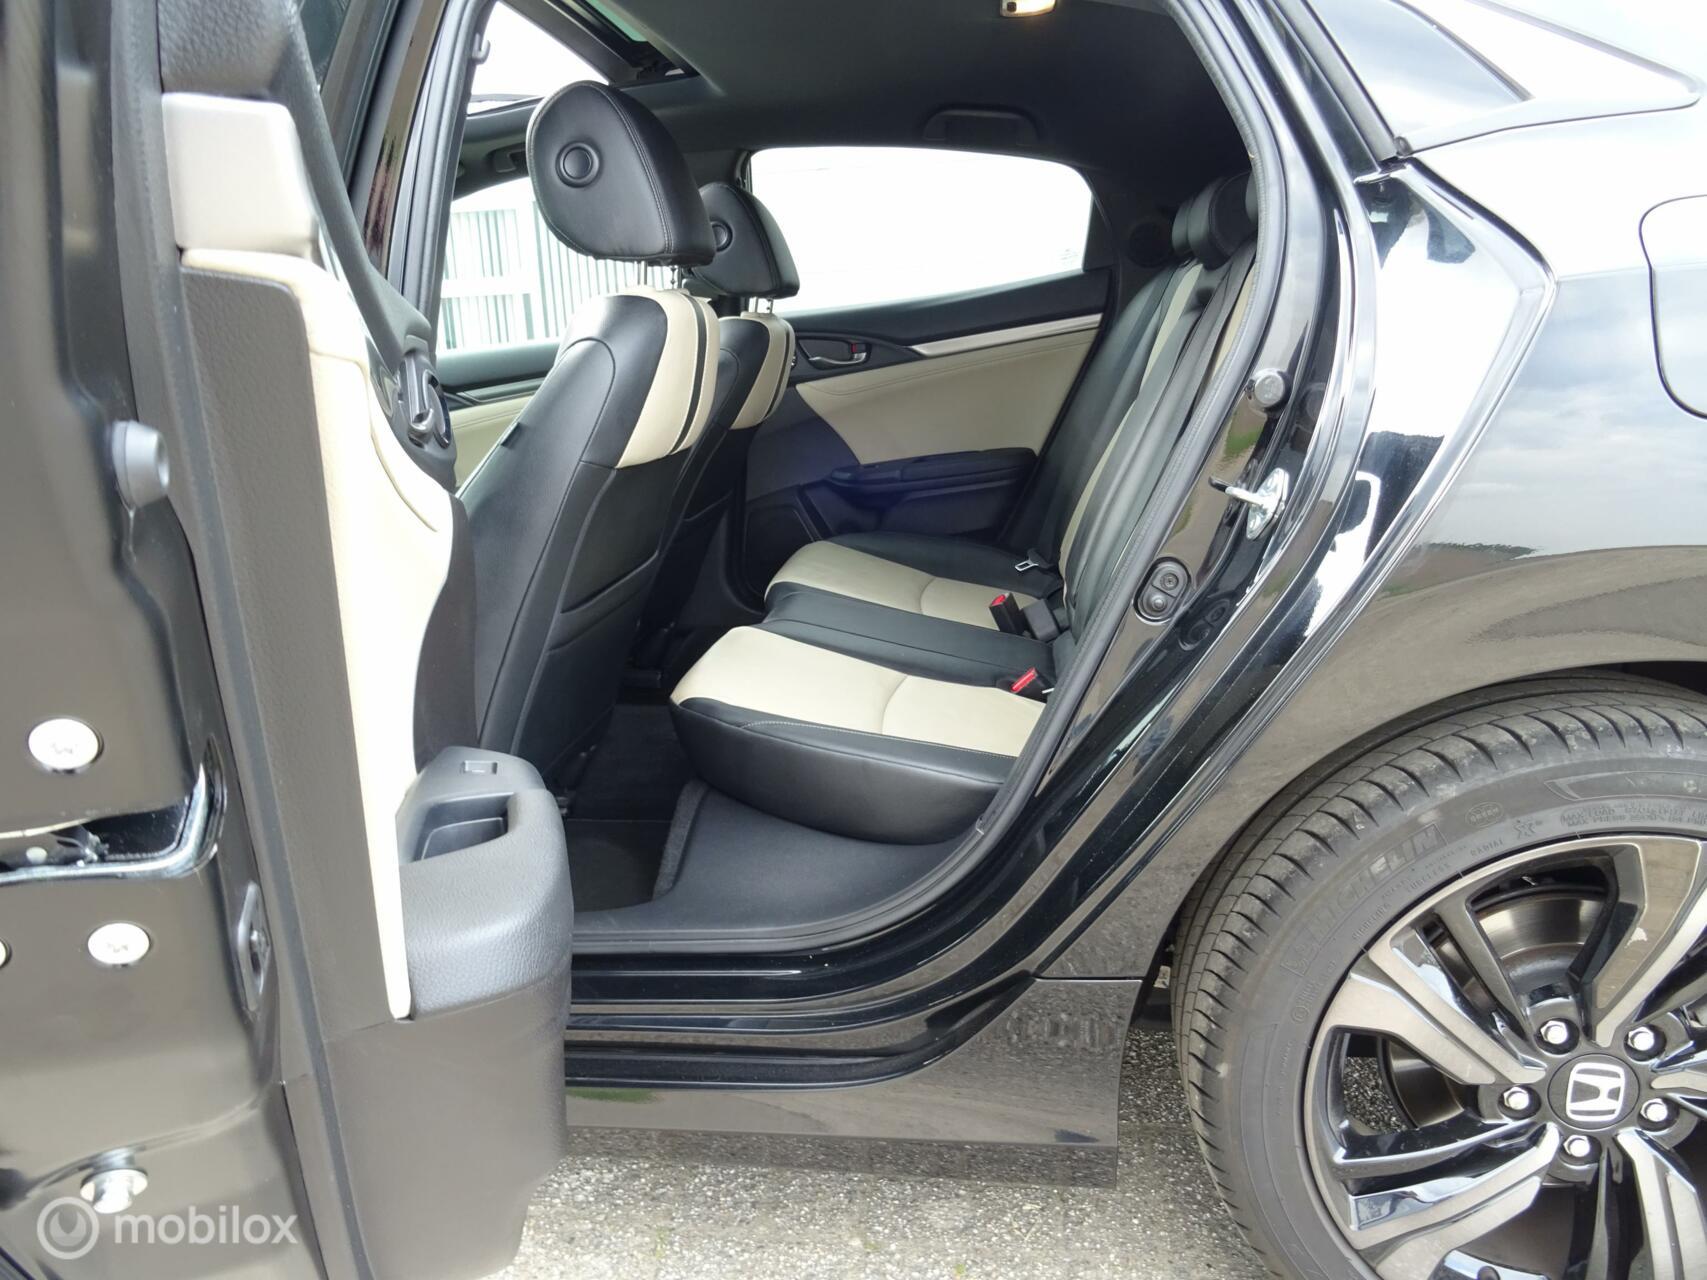 Honda Civic 1.5 i-VTEC Prestige